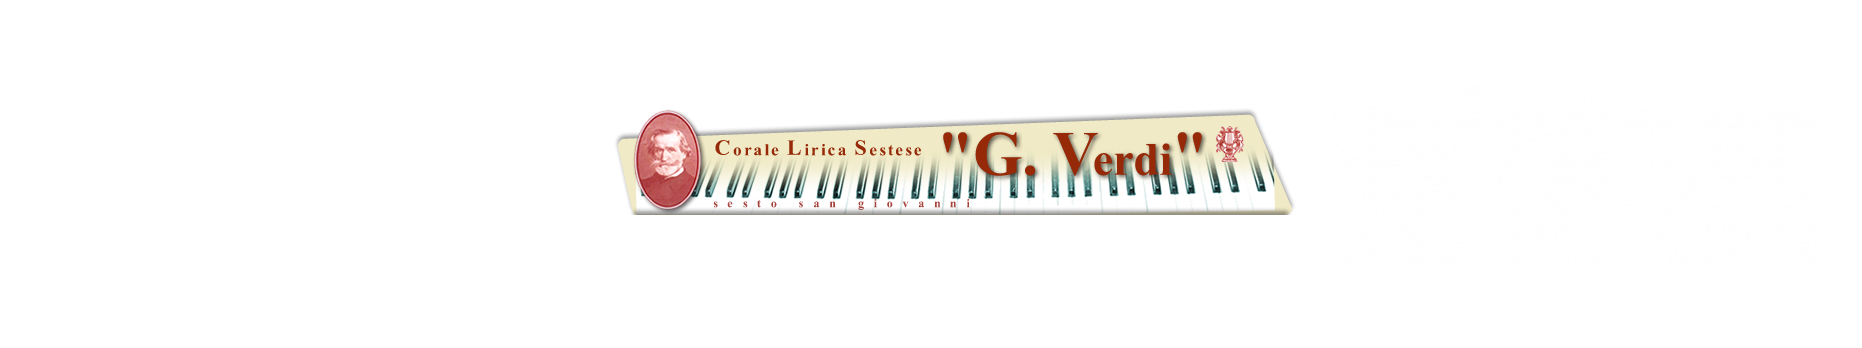 "Associazione Corale lirica Sestese ""Giuseppe Verdi"" - logo"